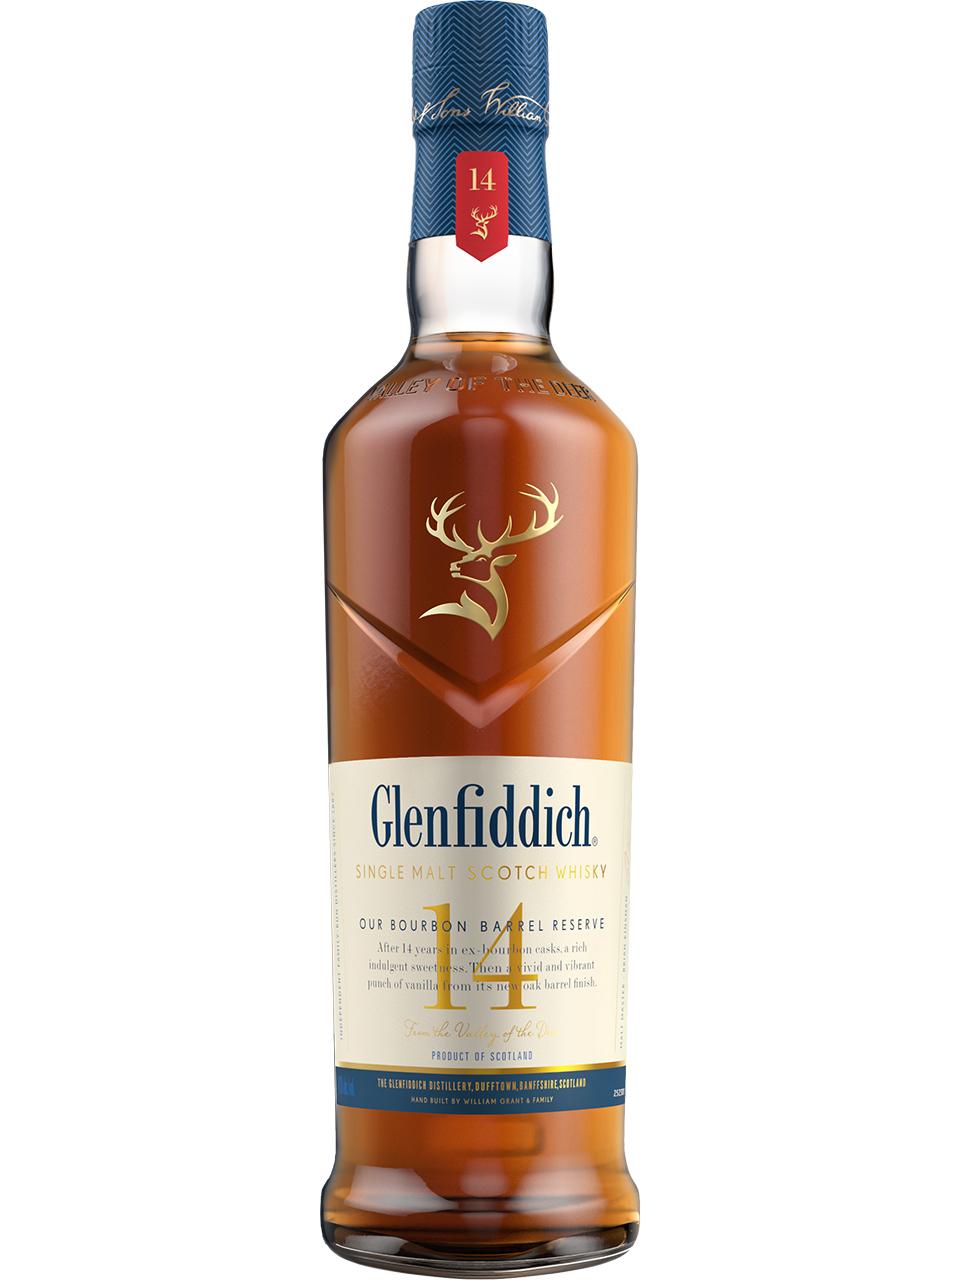 Glenfiddich 14YO Bourbon Barrel Reserve Scotch